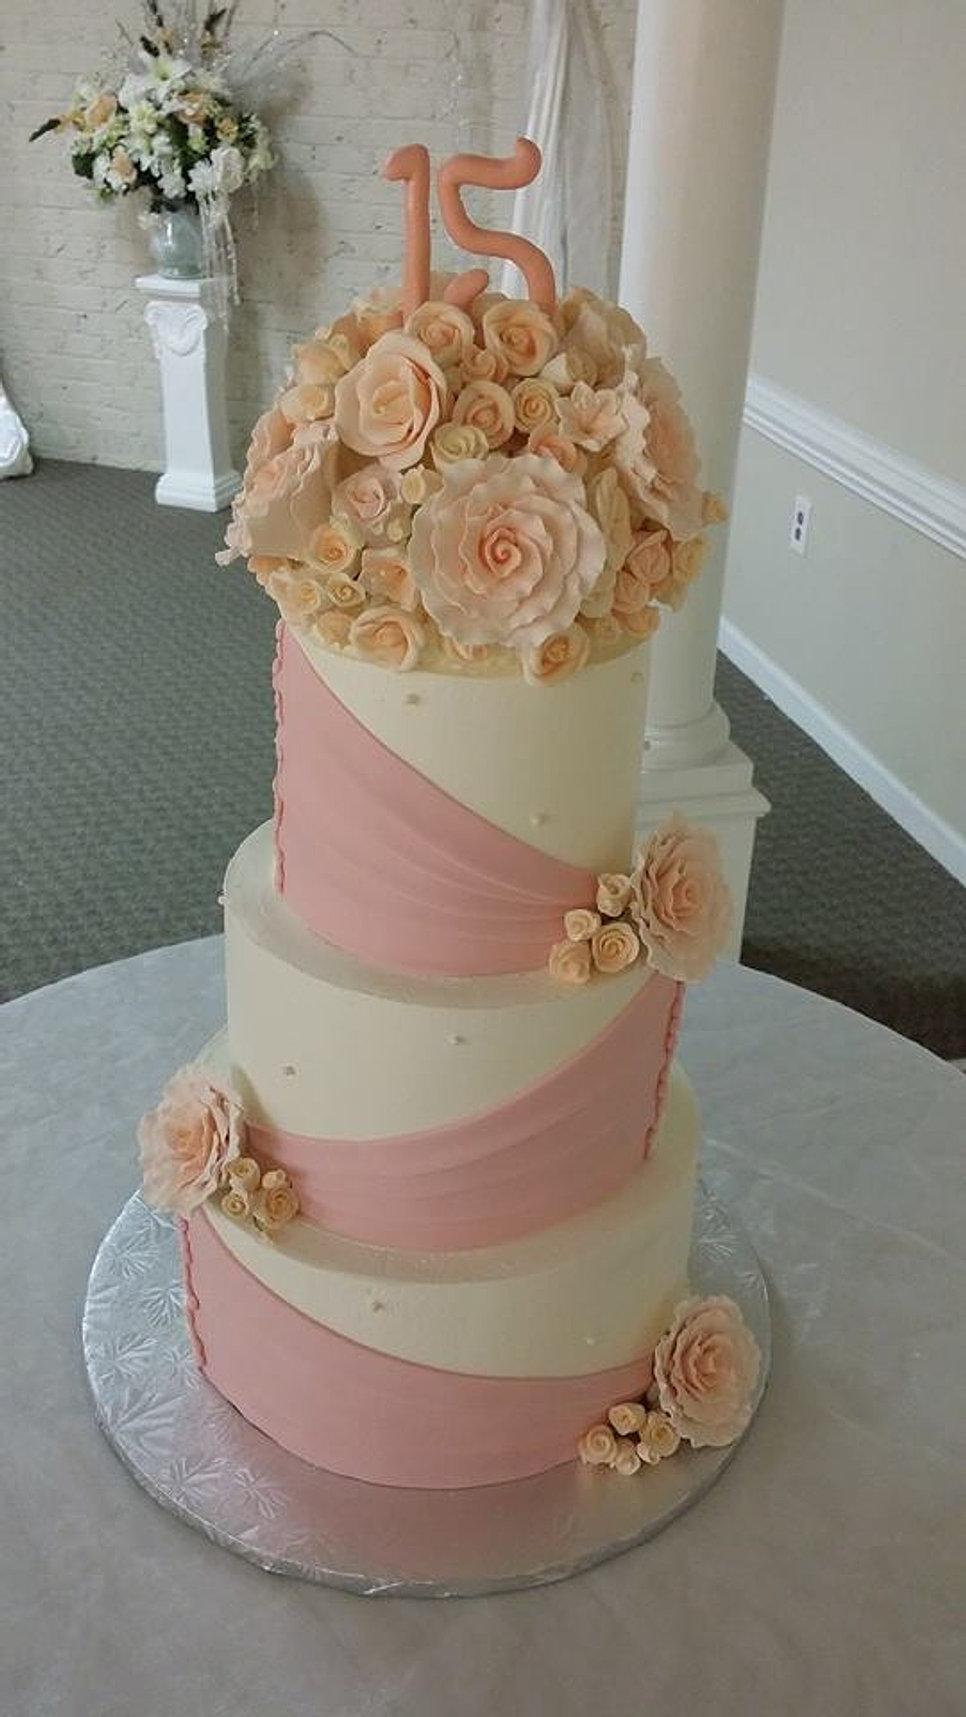 Rachel Bailey Cake Artist : Rachel Bailey - Cake Artist, wedding cakes nc Special ...